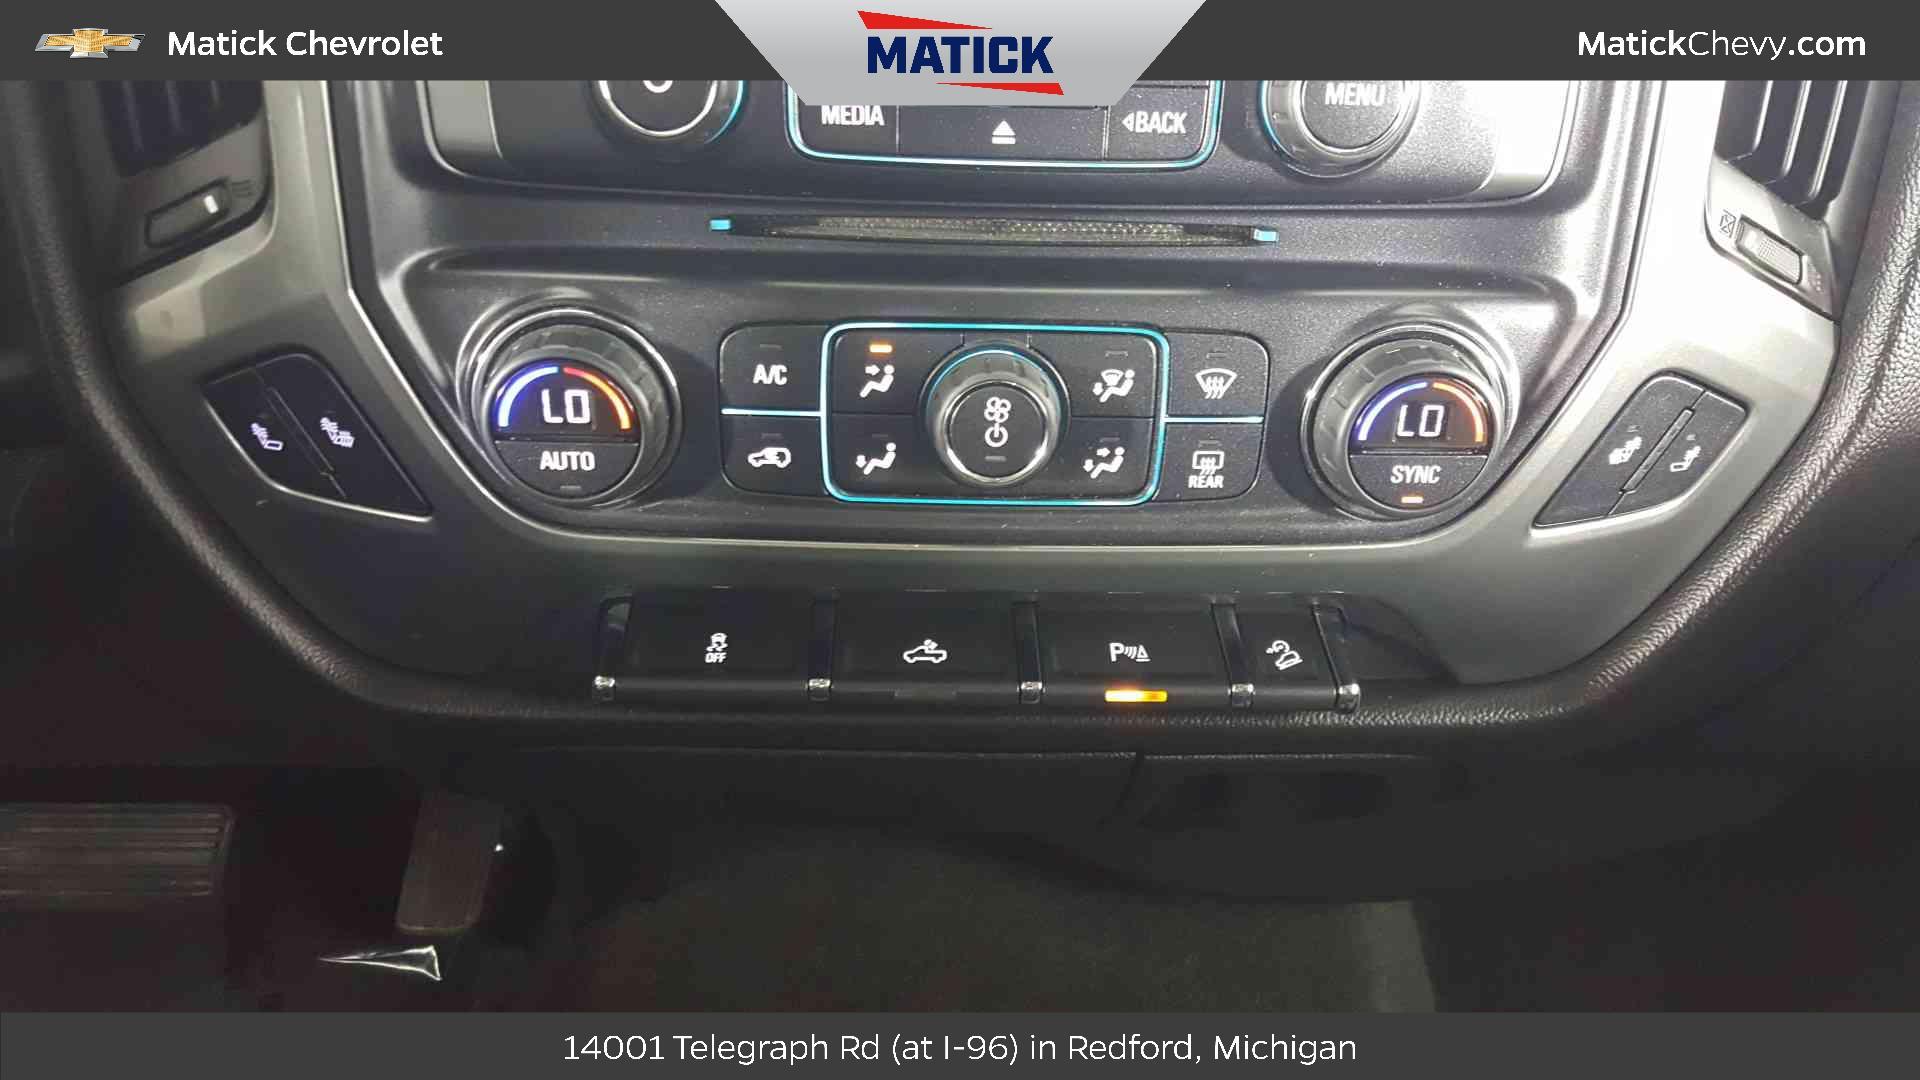 2015 Chevrolet Silverado 1500 In Detroit George Matick Chevy Center Console 21